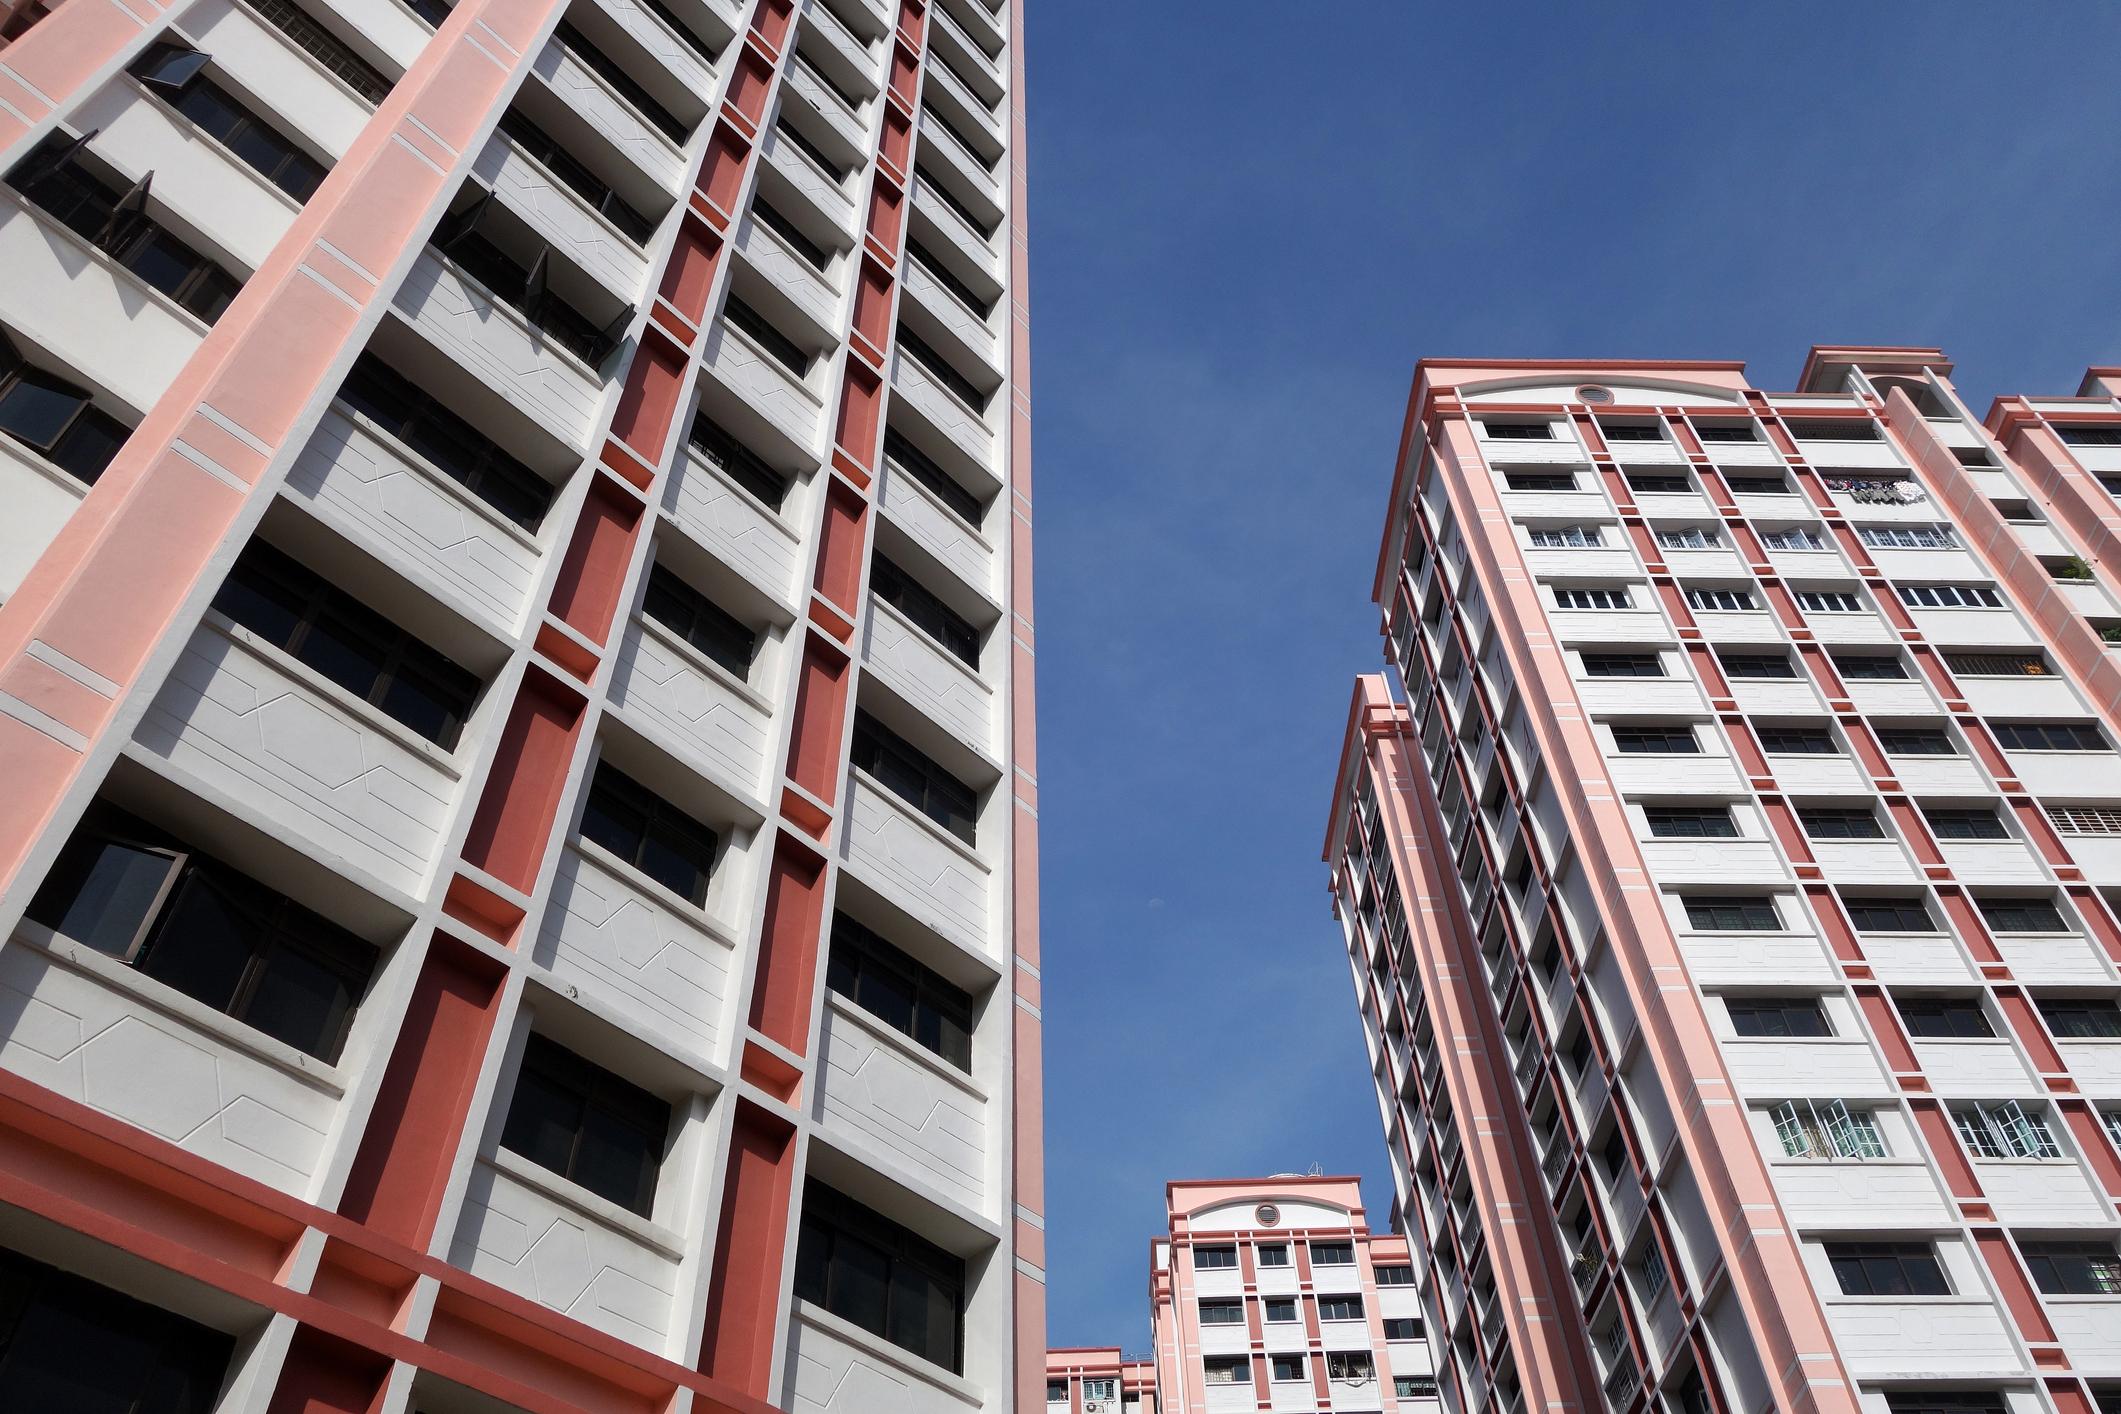 Property jargon: EC